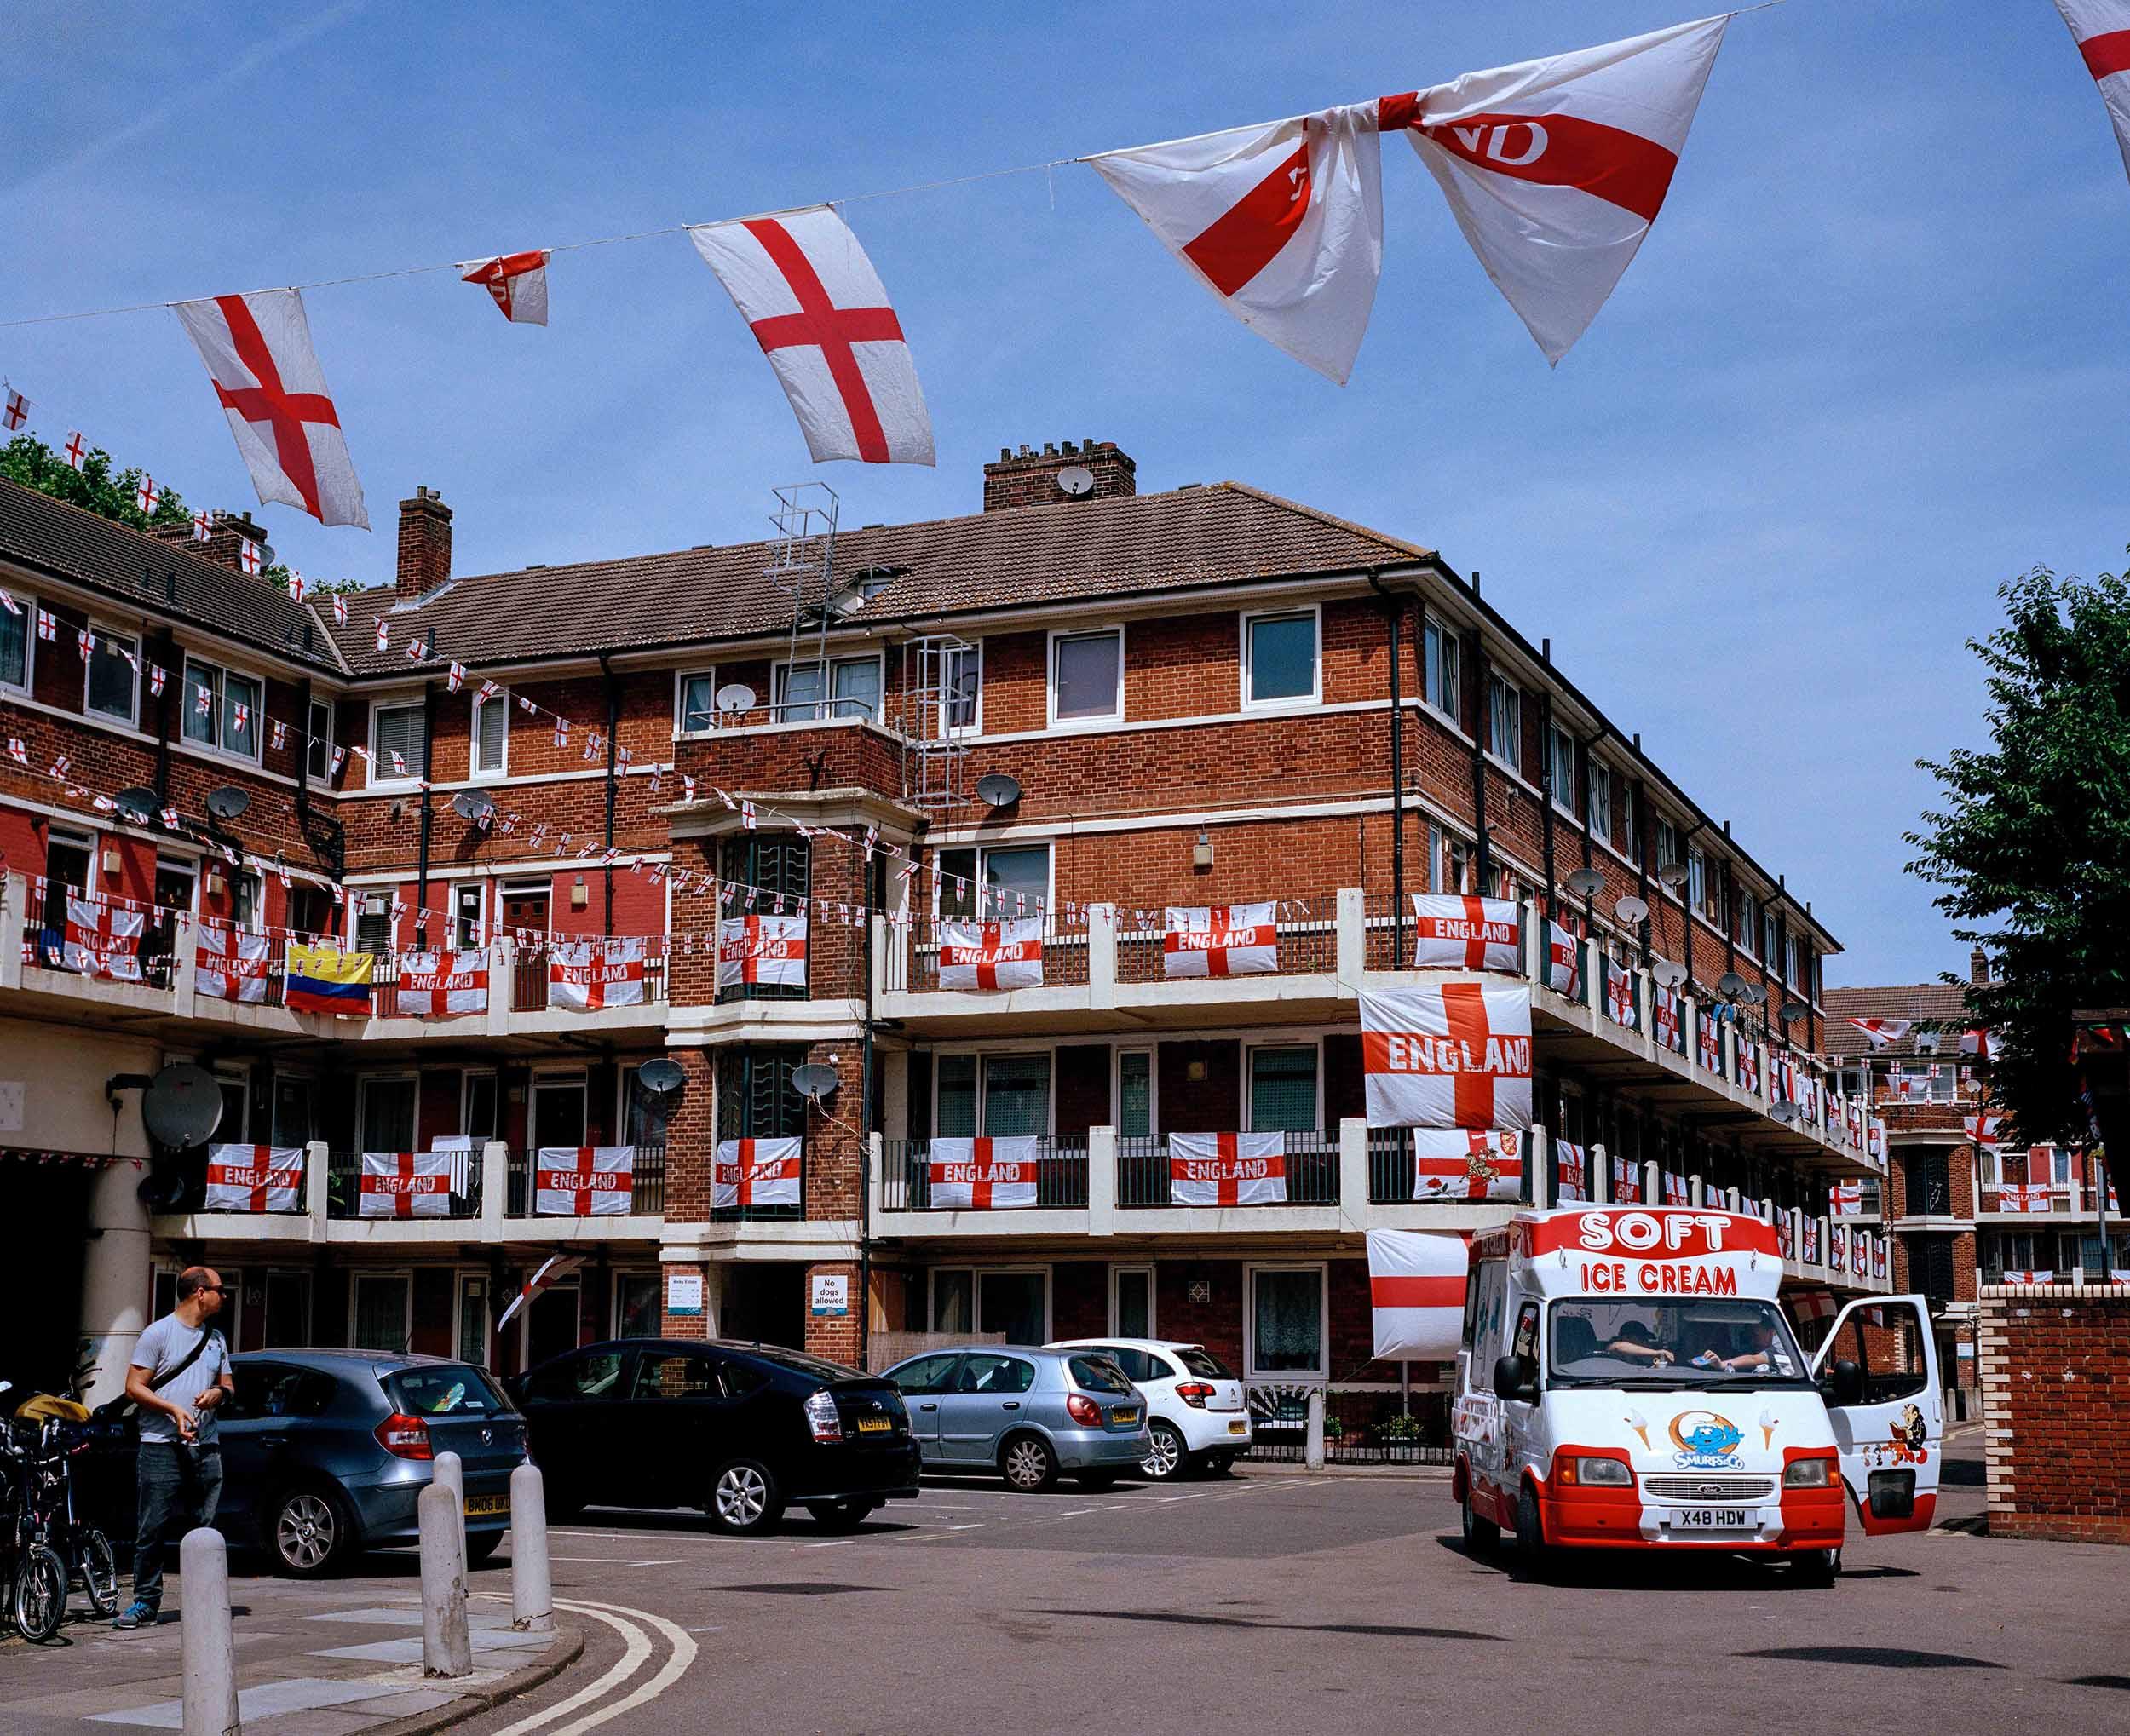 24-blighty-england-london-sam-gregg-photography.jpg